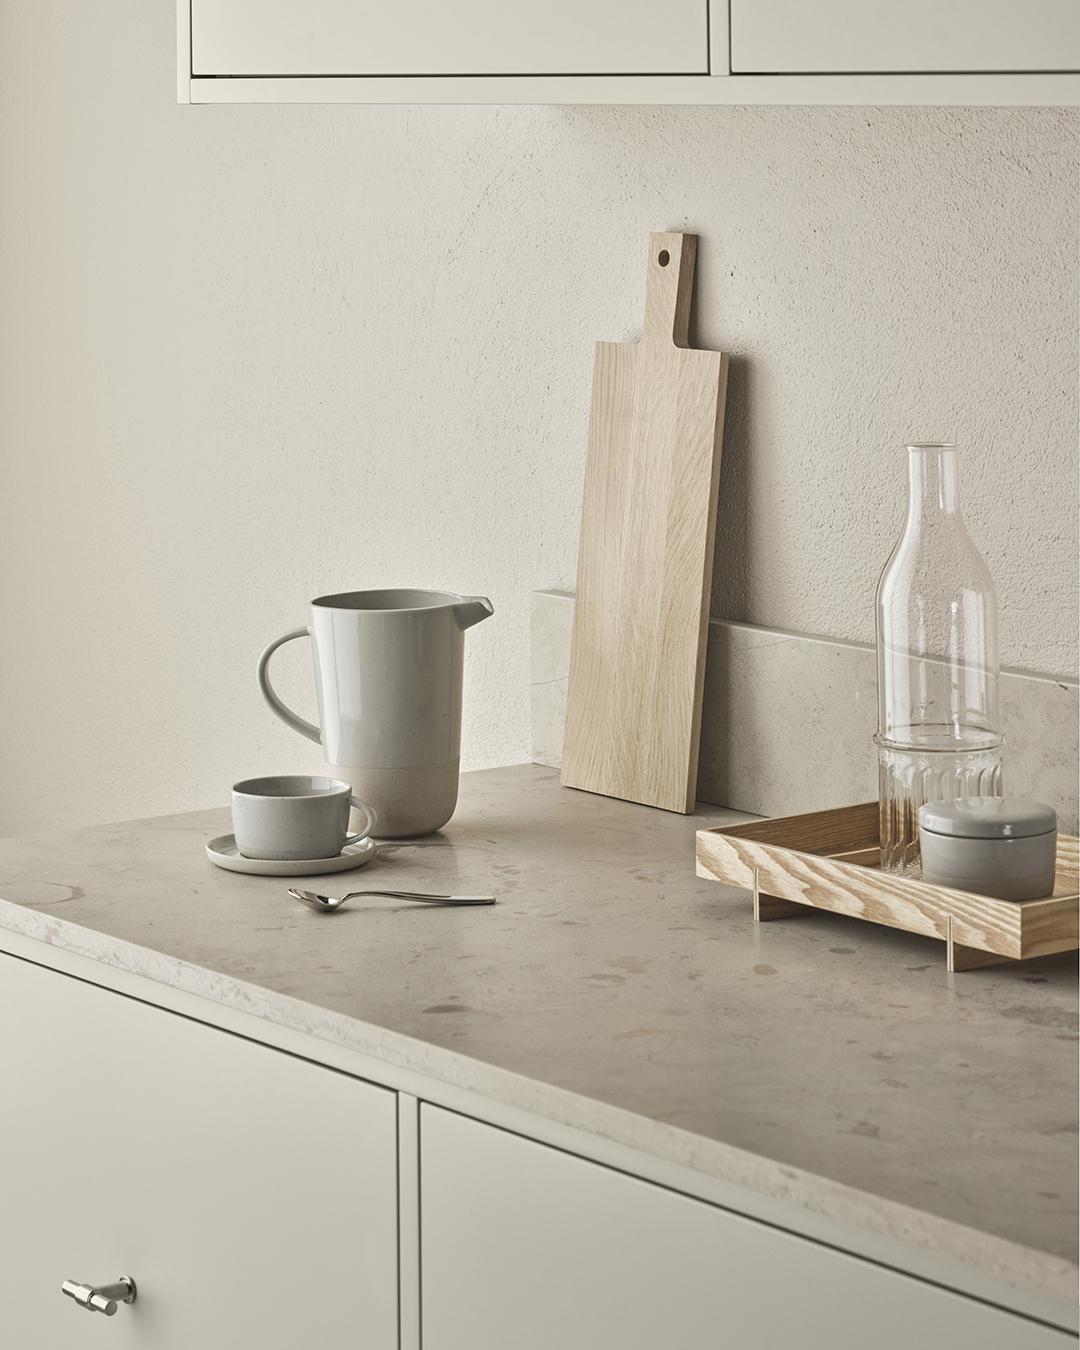 Minimalist Scandinavian kitchen with grey cupboards, stone worktops and oak chopping board | Eight inspiring kitchen ideas from Nordiska Kök's new showroom | These Four Walls blog